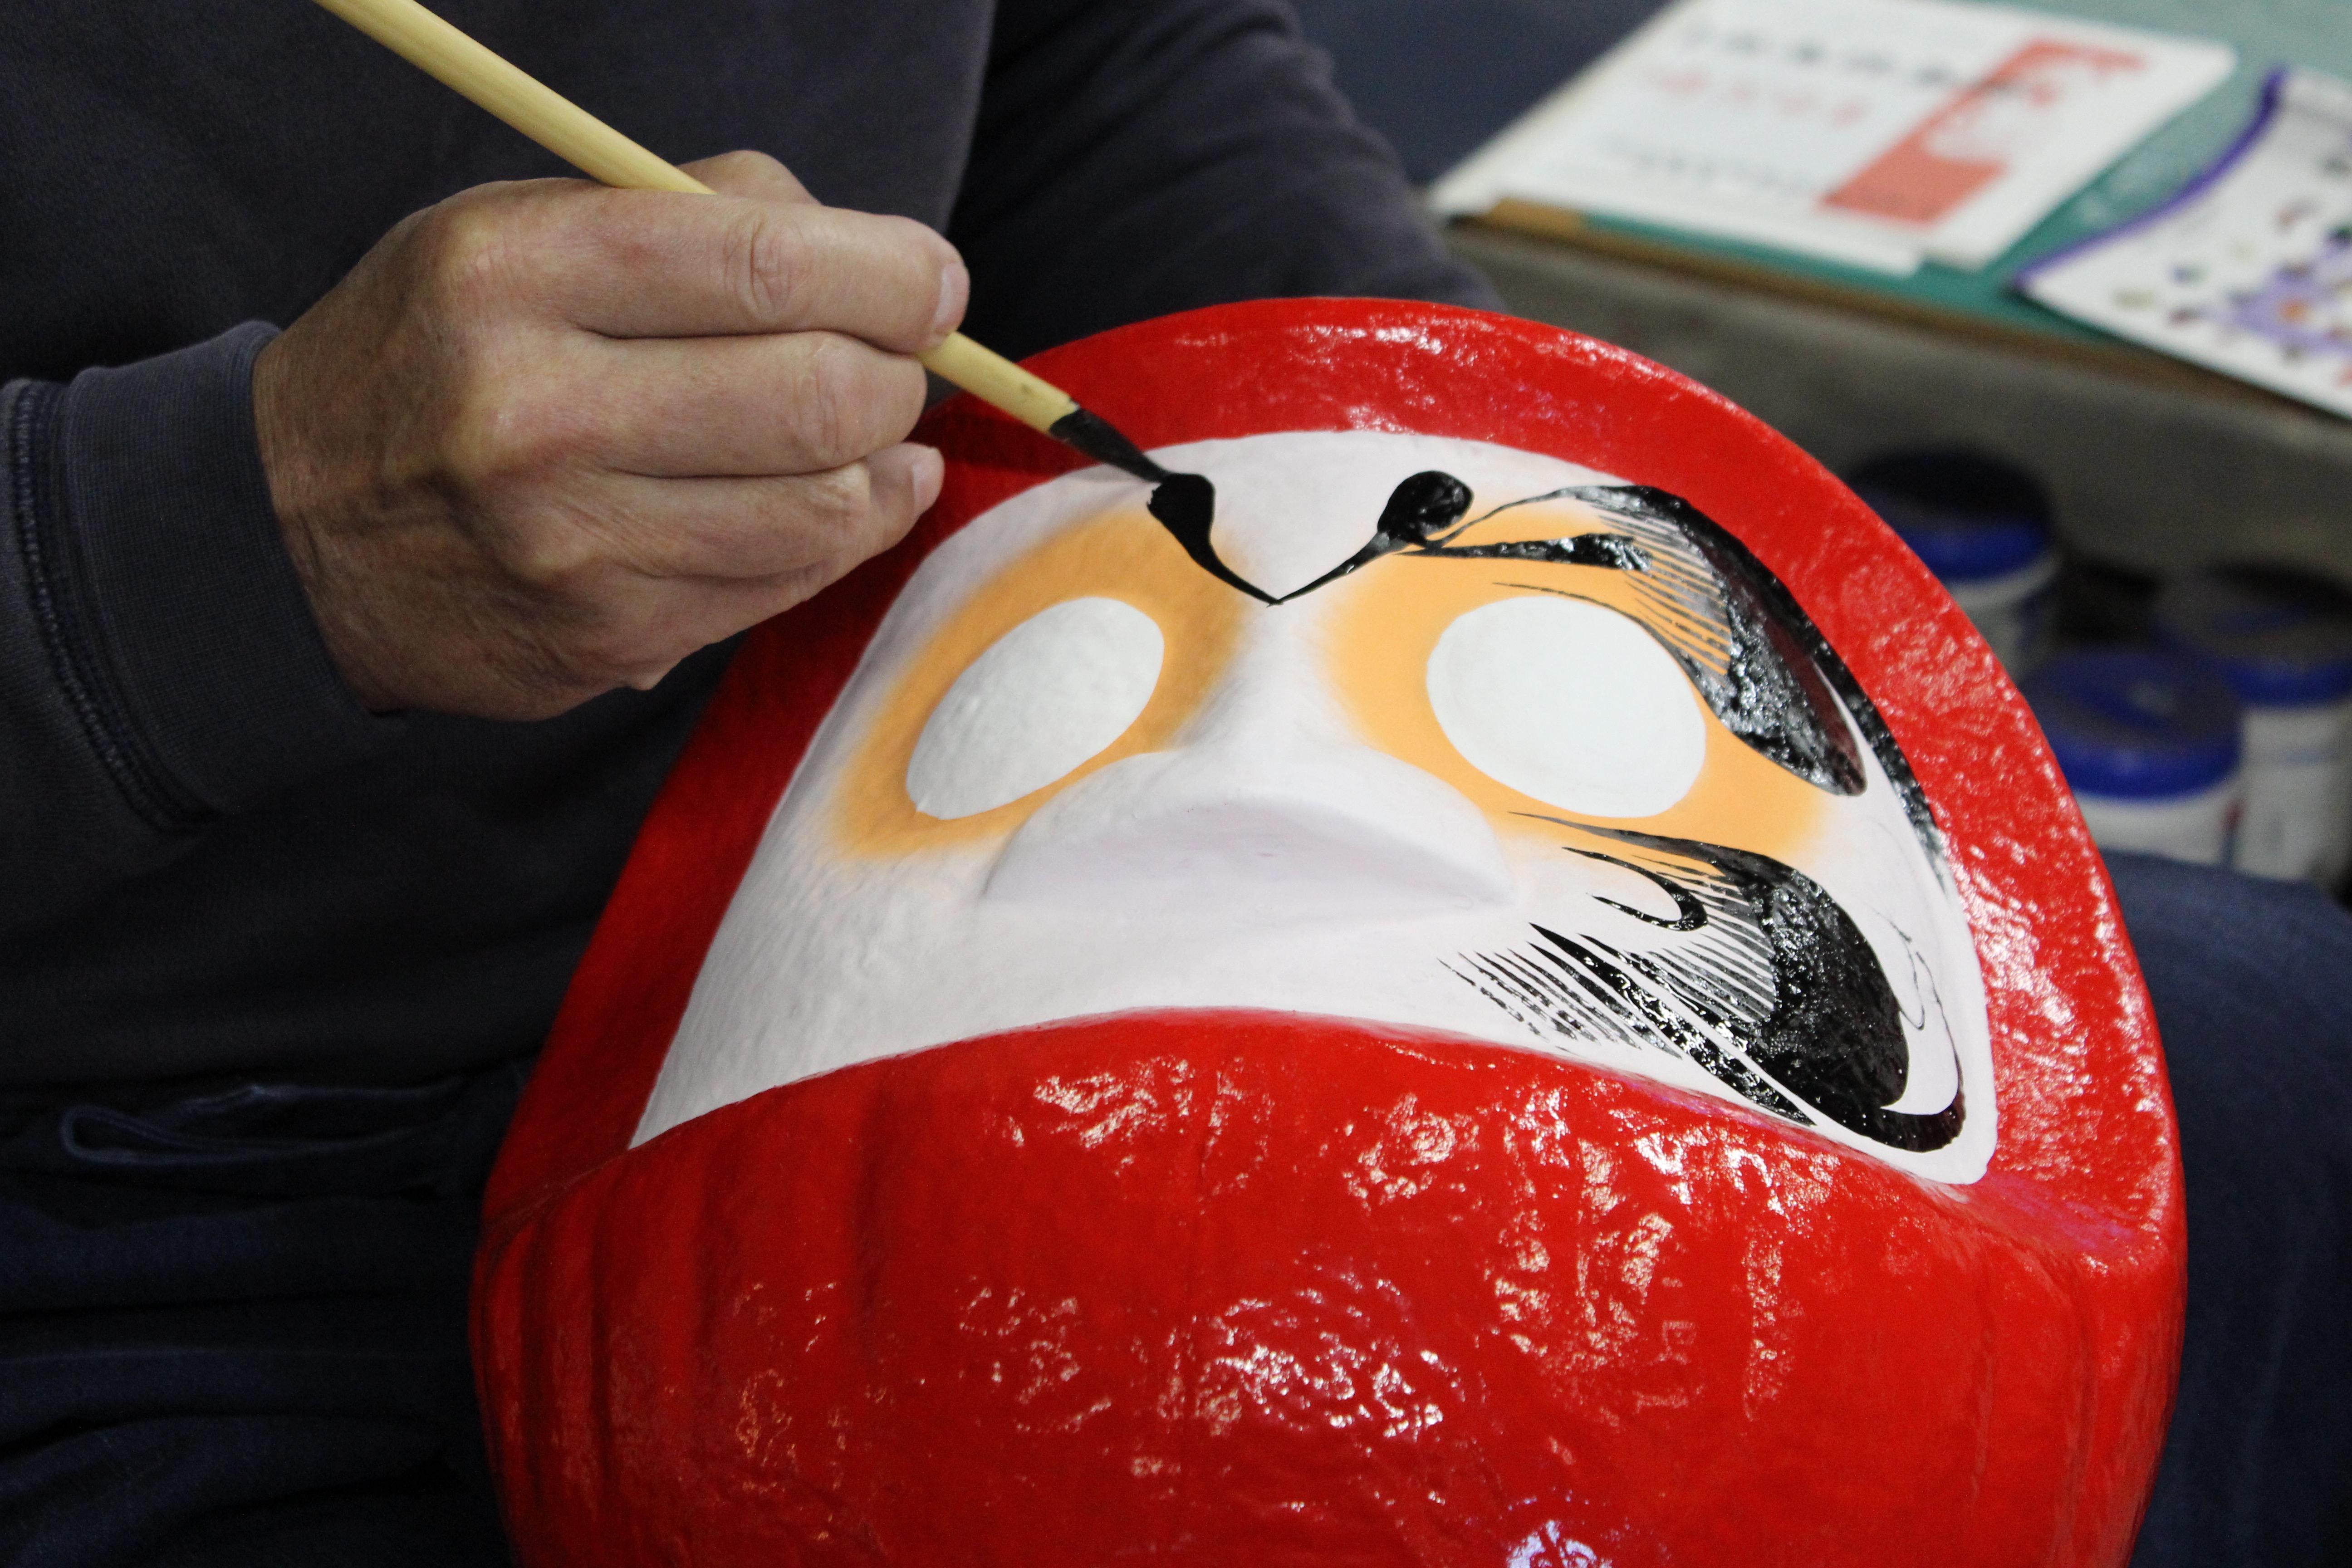 Takasaki City and Daruma Dolls | Explore Japan Locals